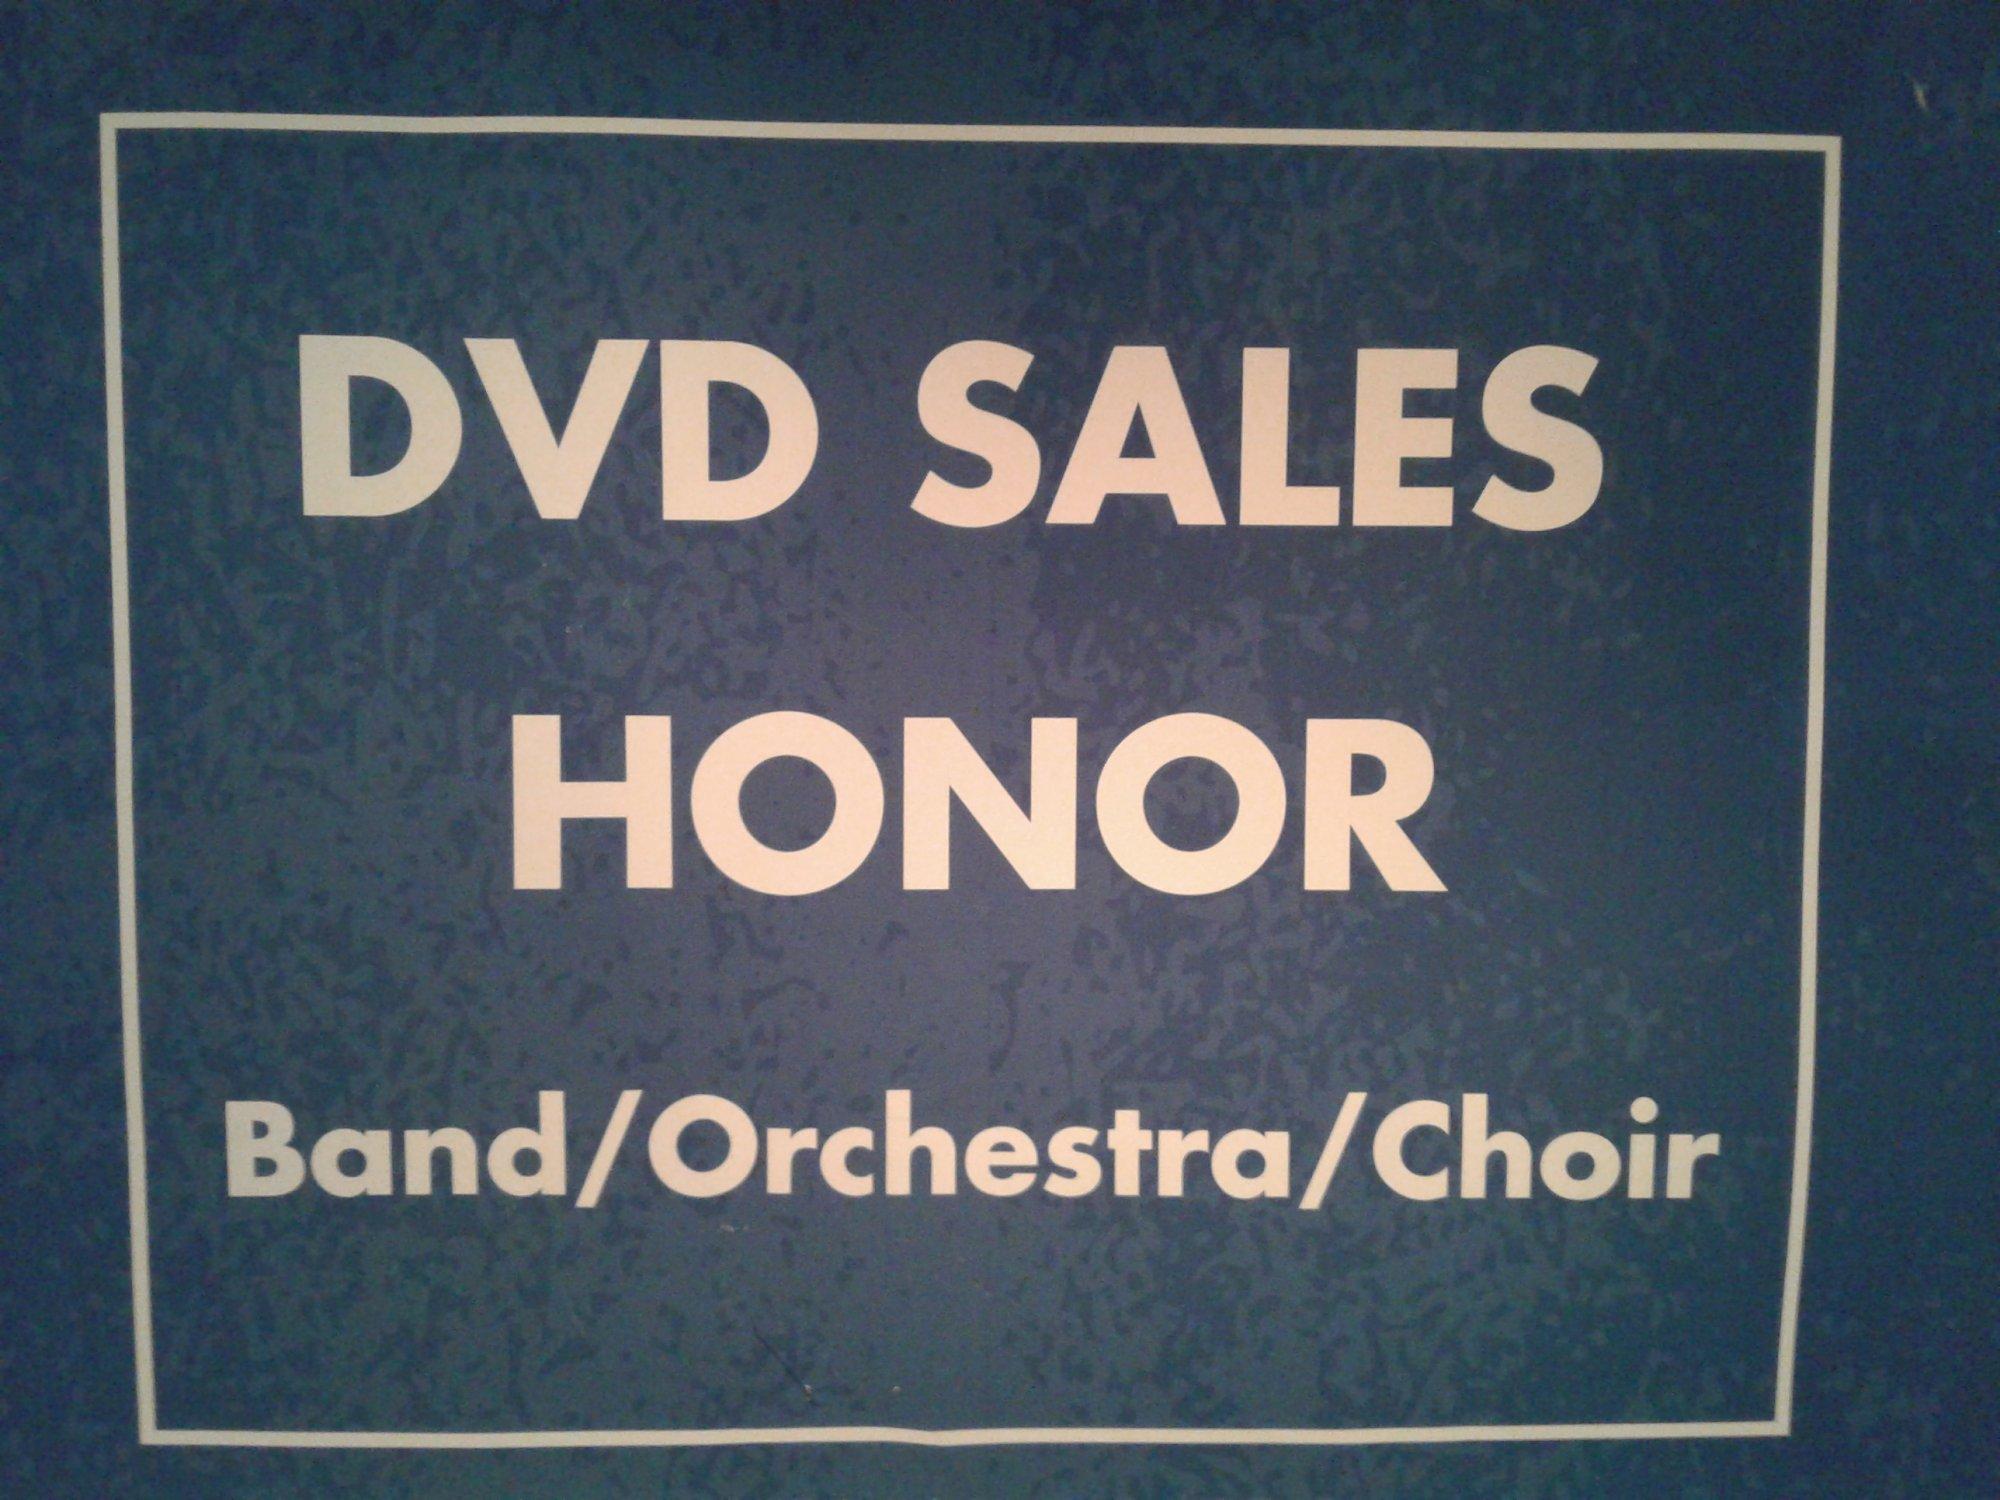 Washoe Honor ORCHESTRA dvd - Nov. 8th 2018